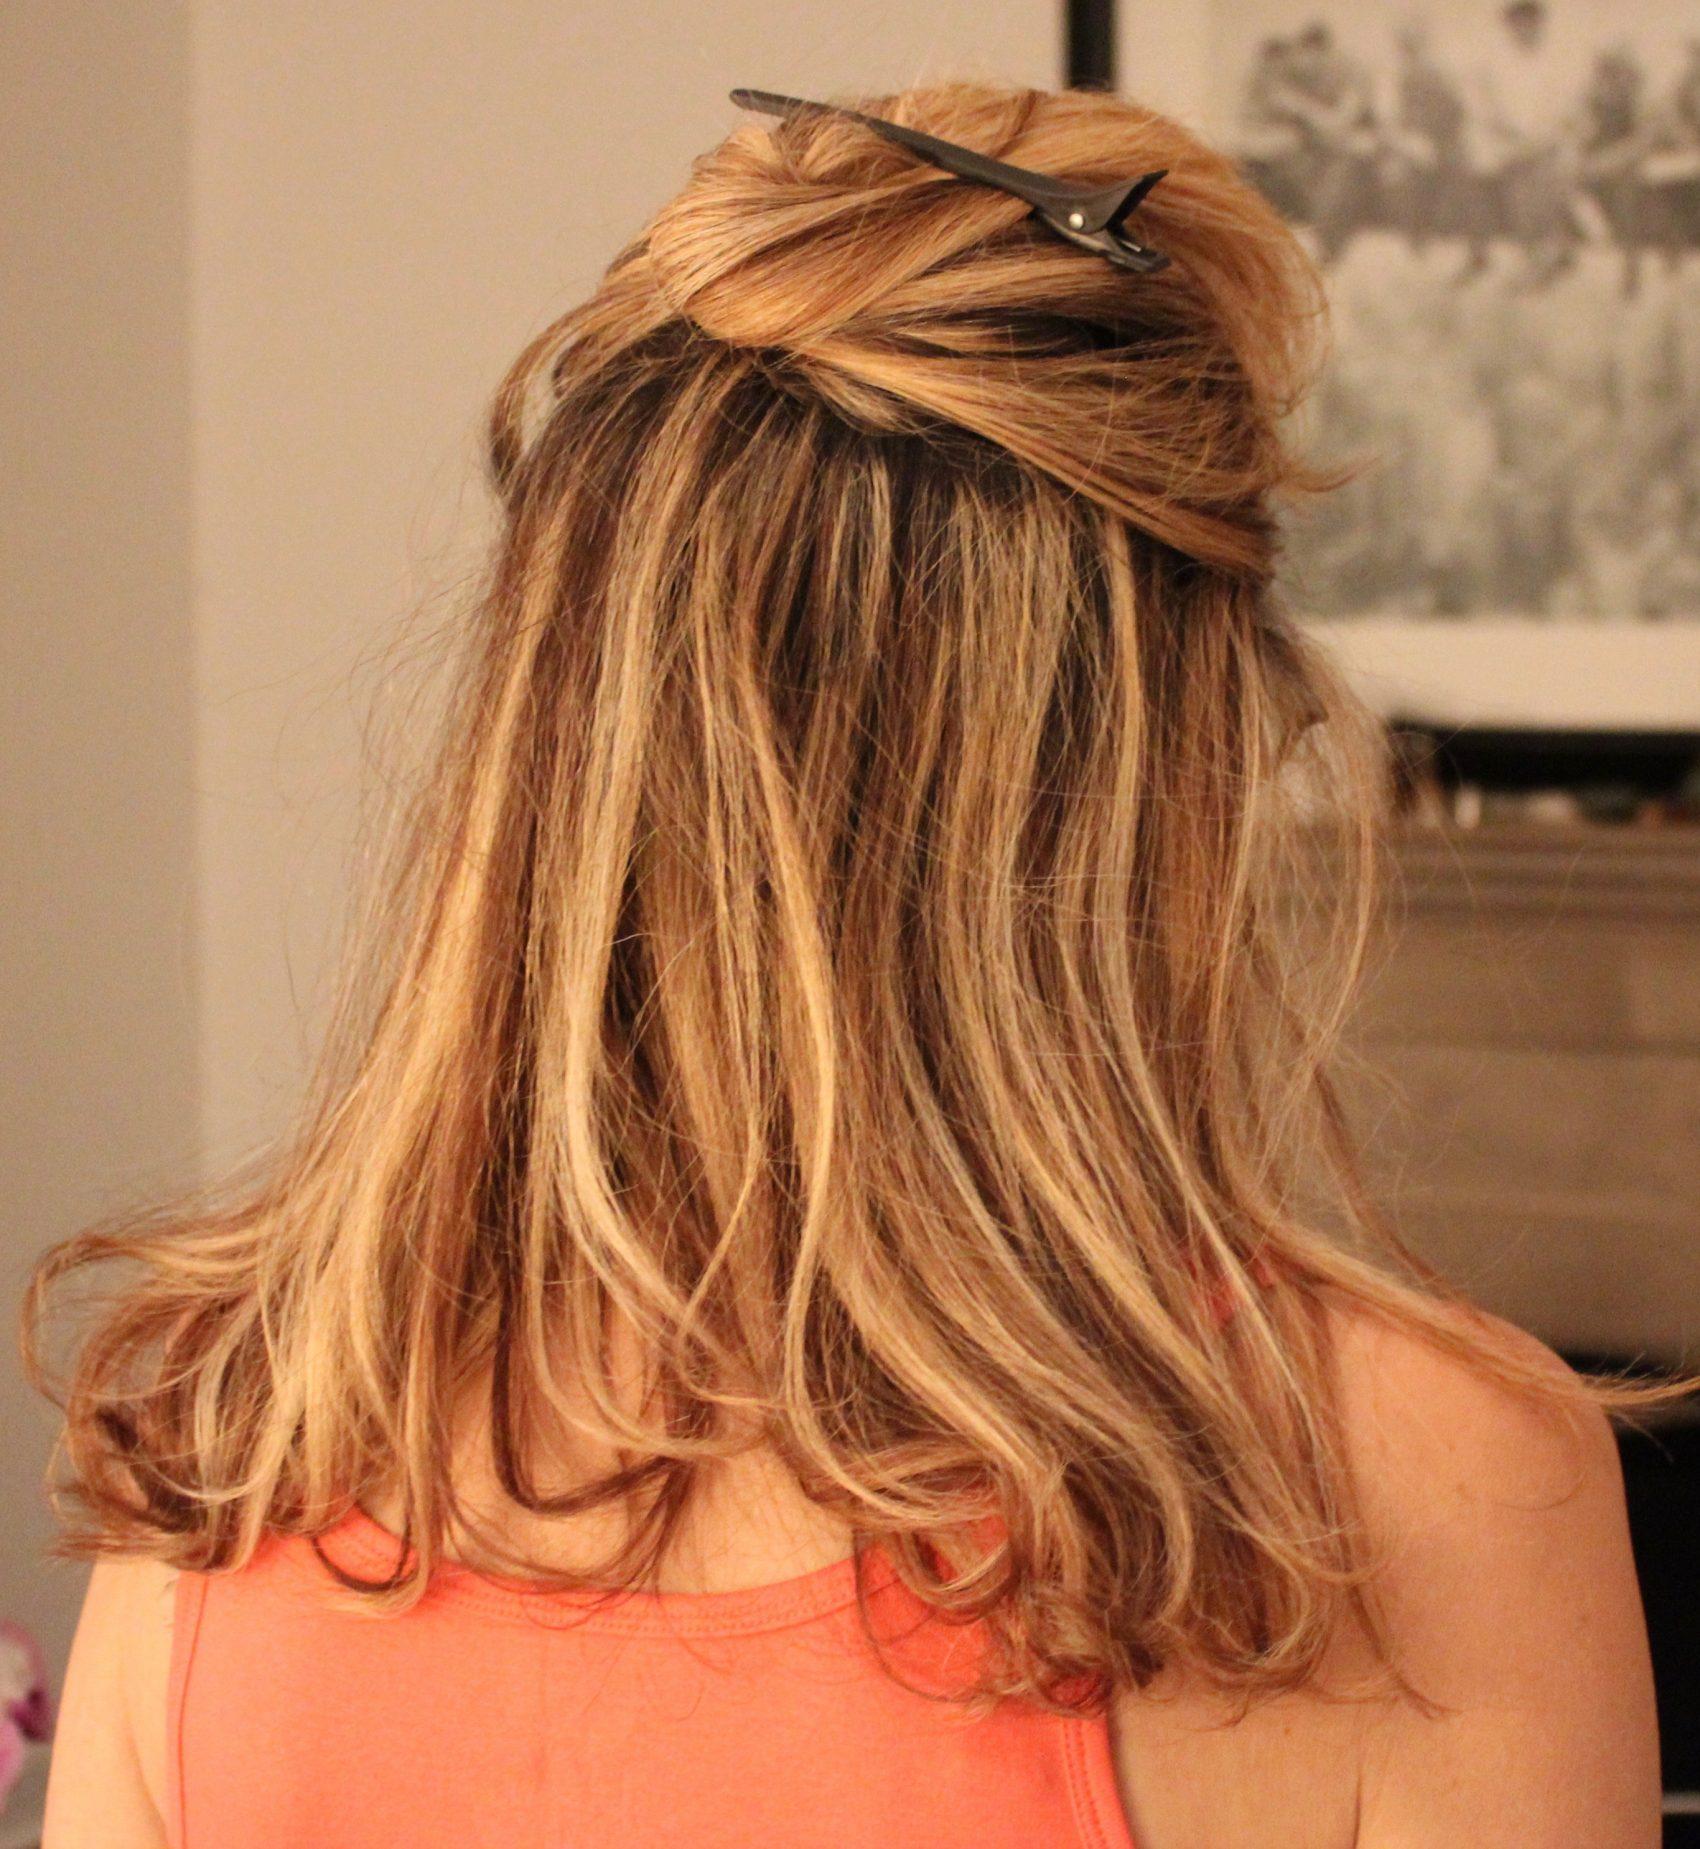 hair-1-1